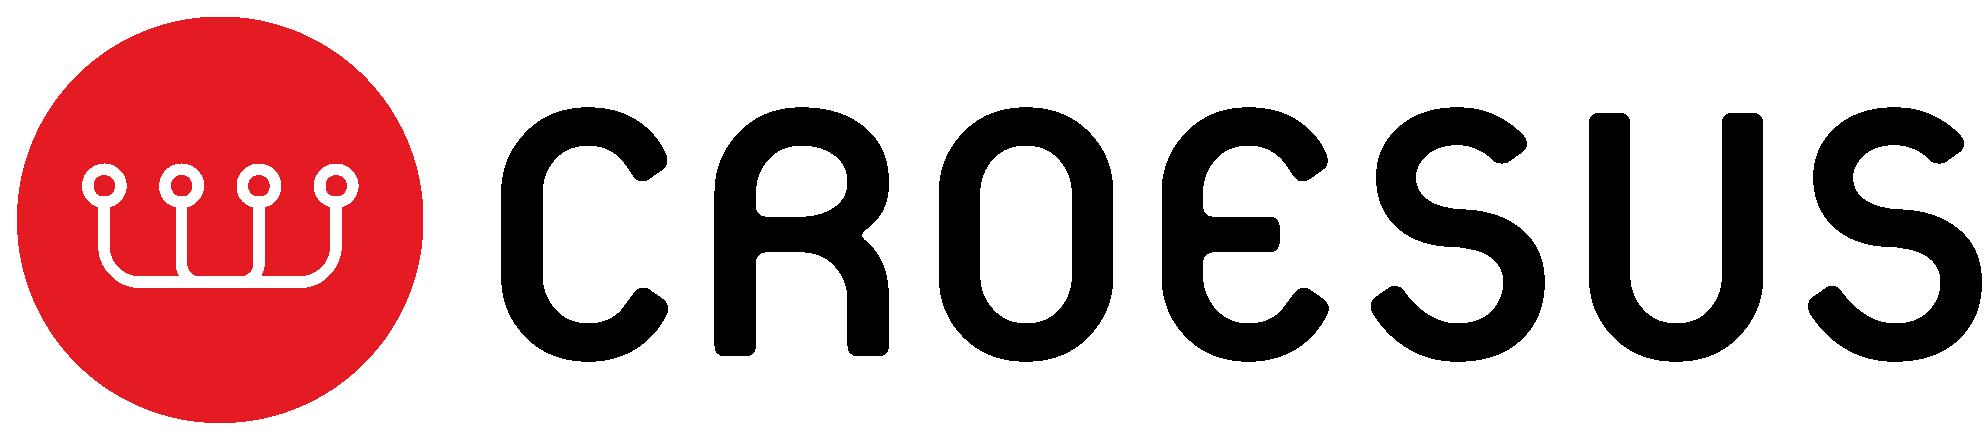 Croesus-logo-CIR-R-CRO-T-TXT-B-Big